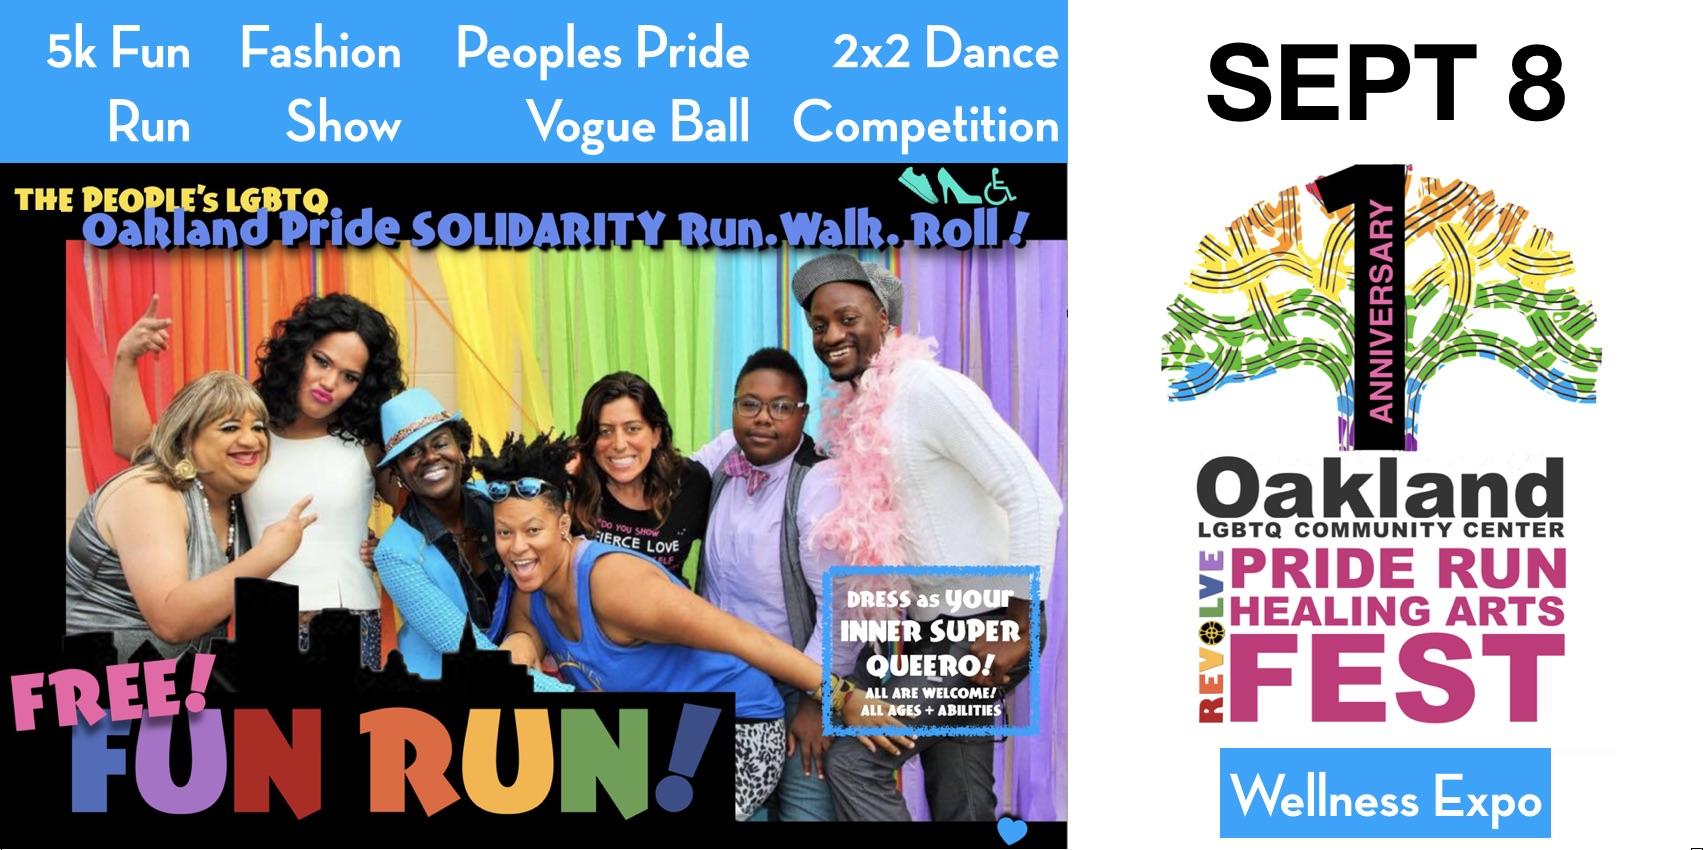 People's Oakland Pride Fun Run + Healing Arts Expo